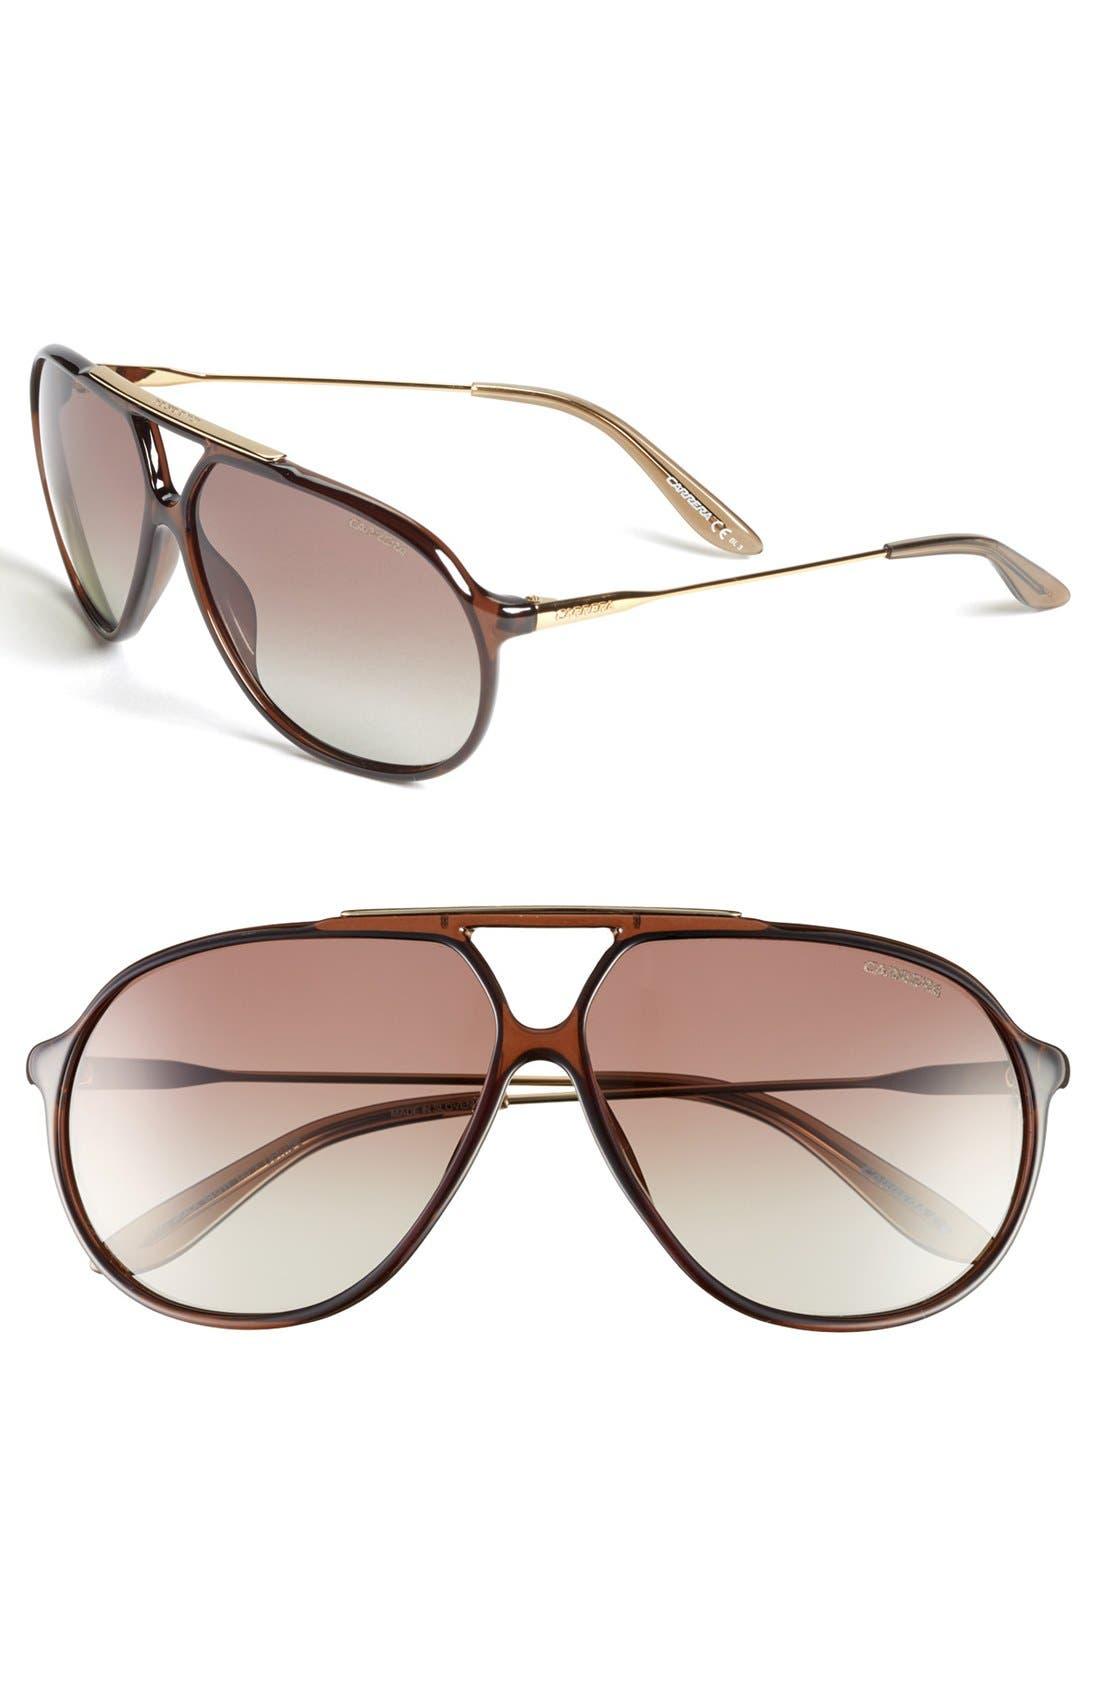 Main Image - Carrera Eyewear 64mm Polarized Aviator Sunglasses